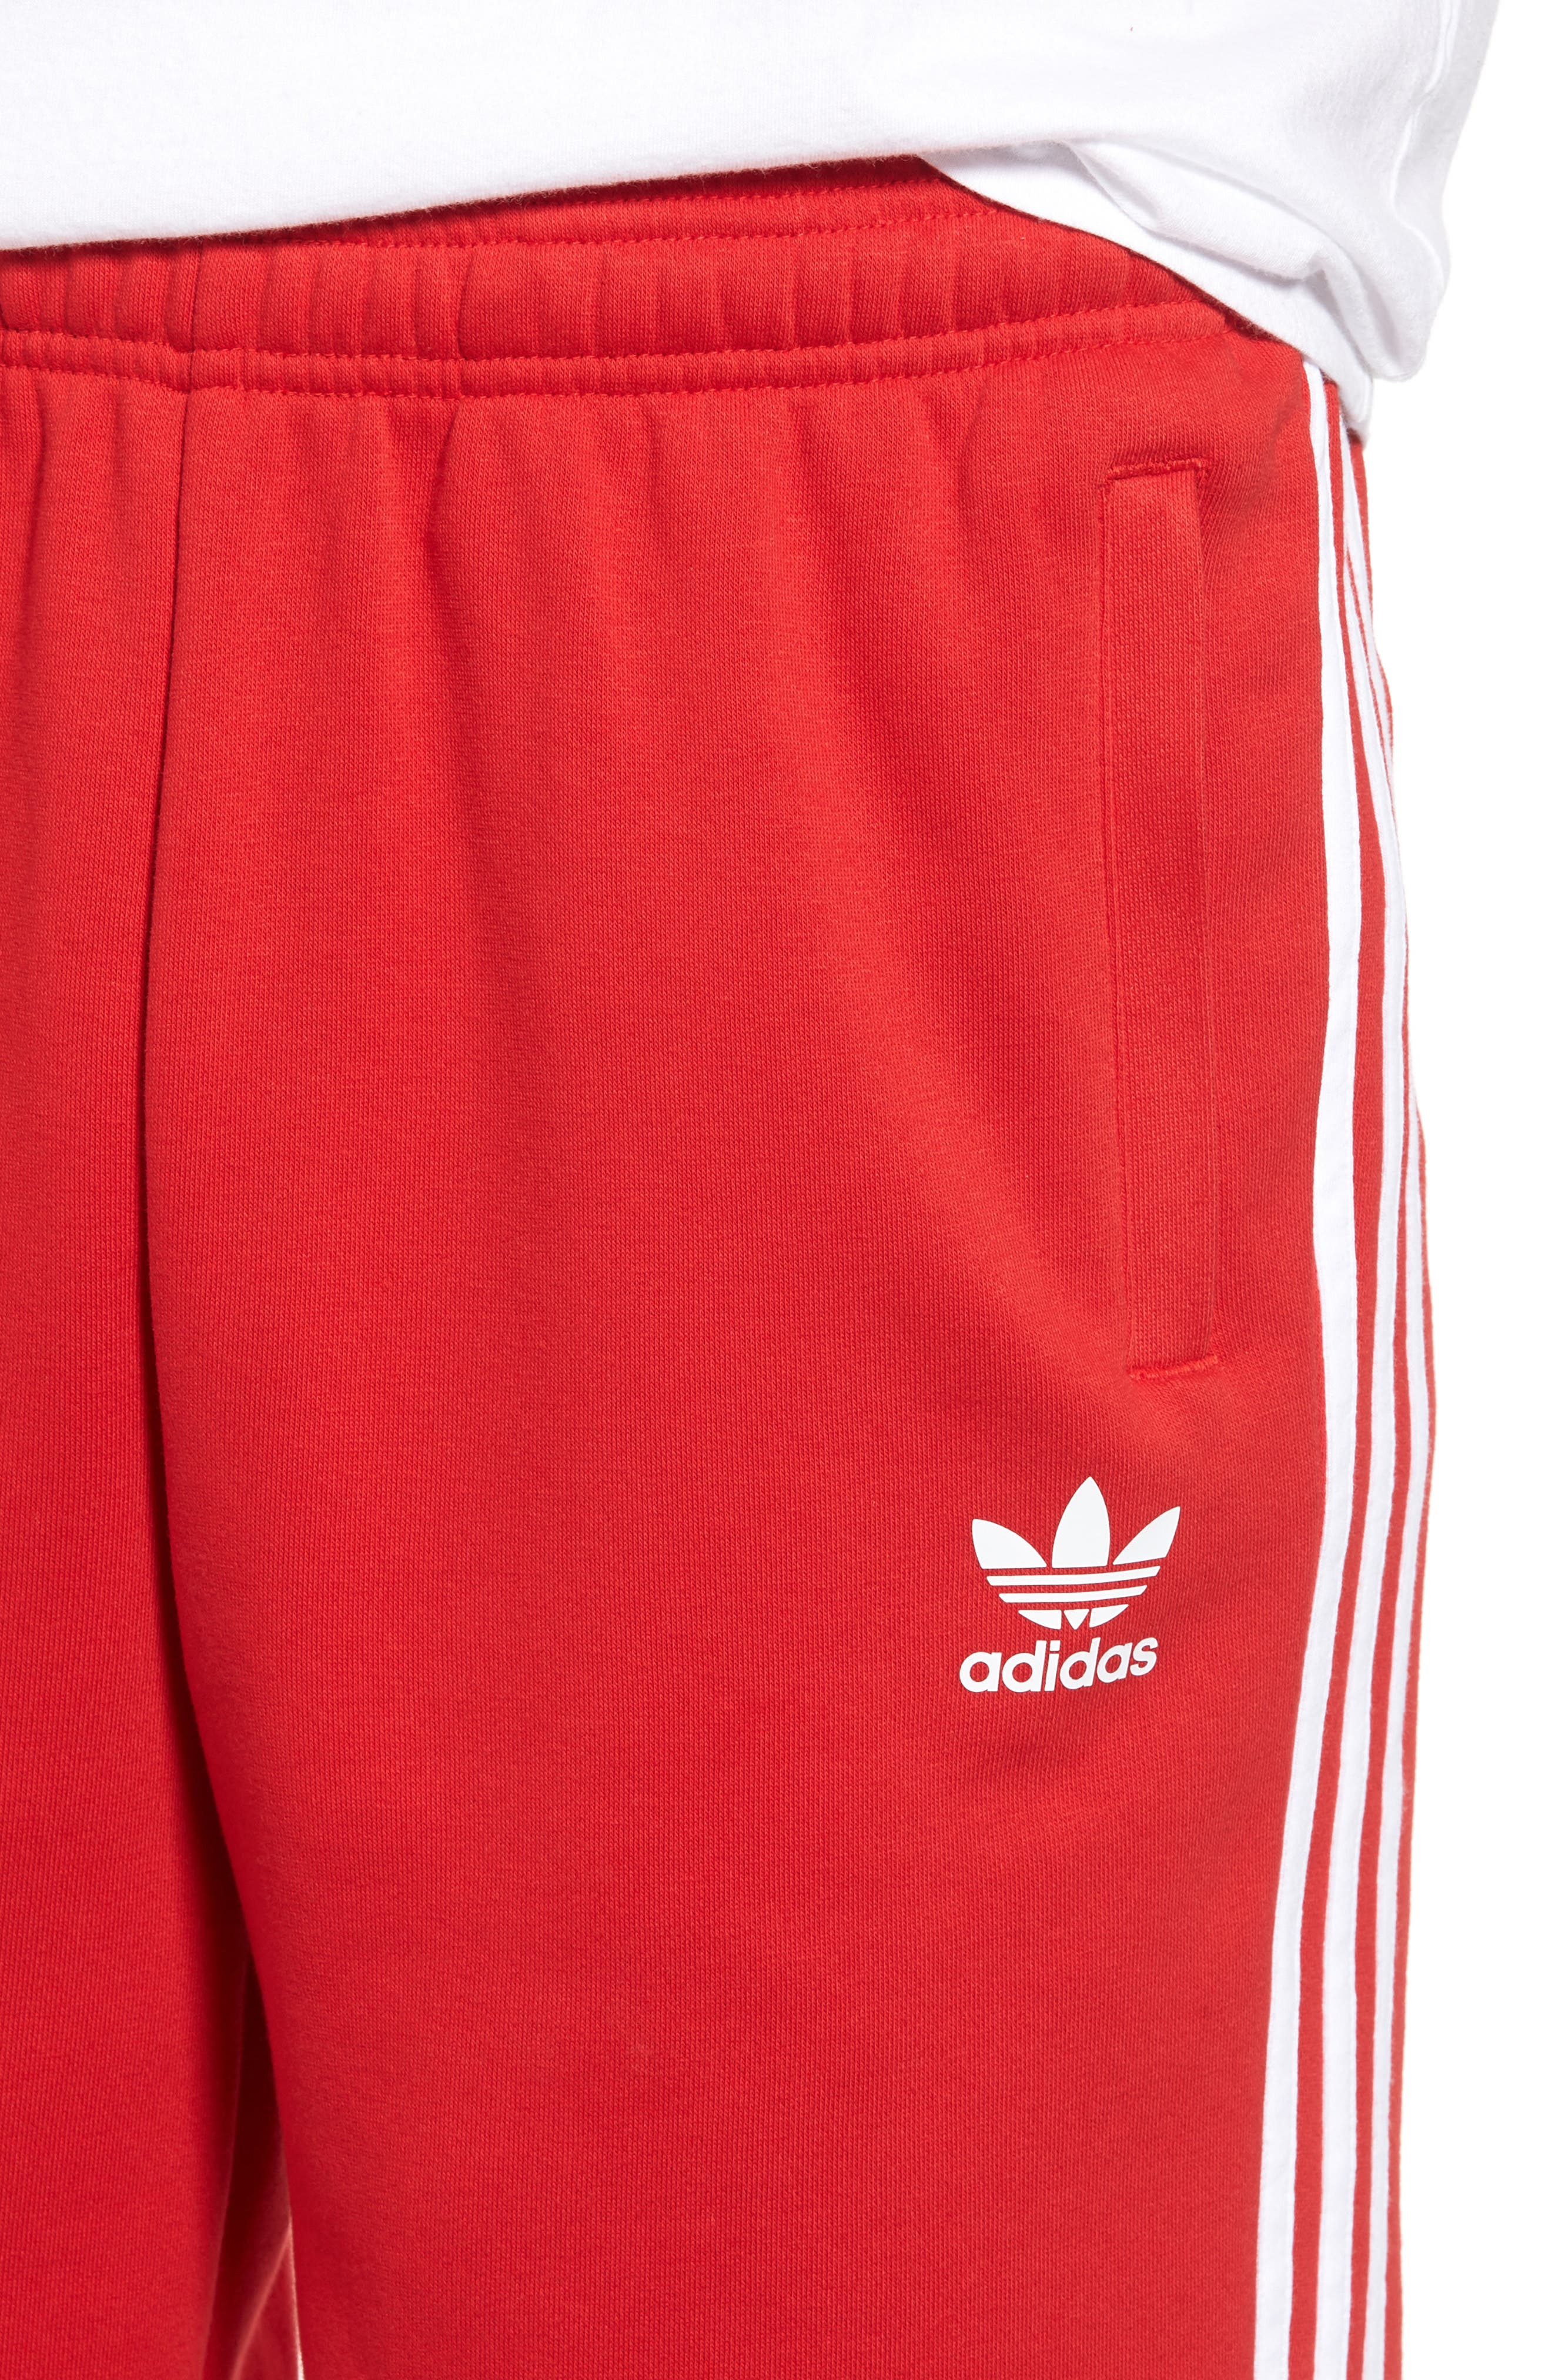 3-Stripes Shorts,                             Alternate thumbnail 4, color,                             Red/ White